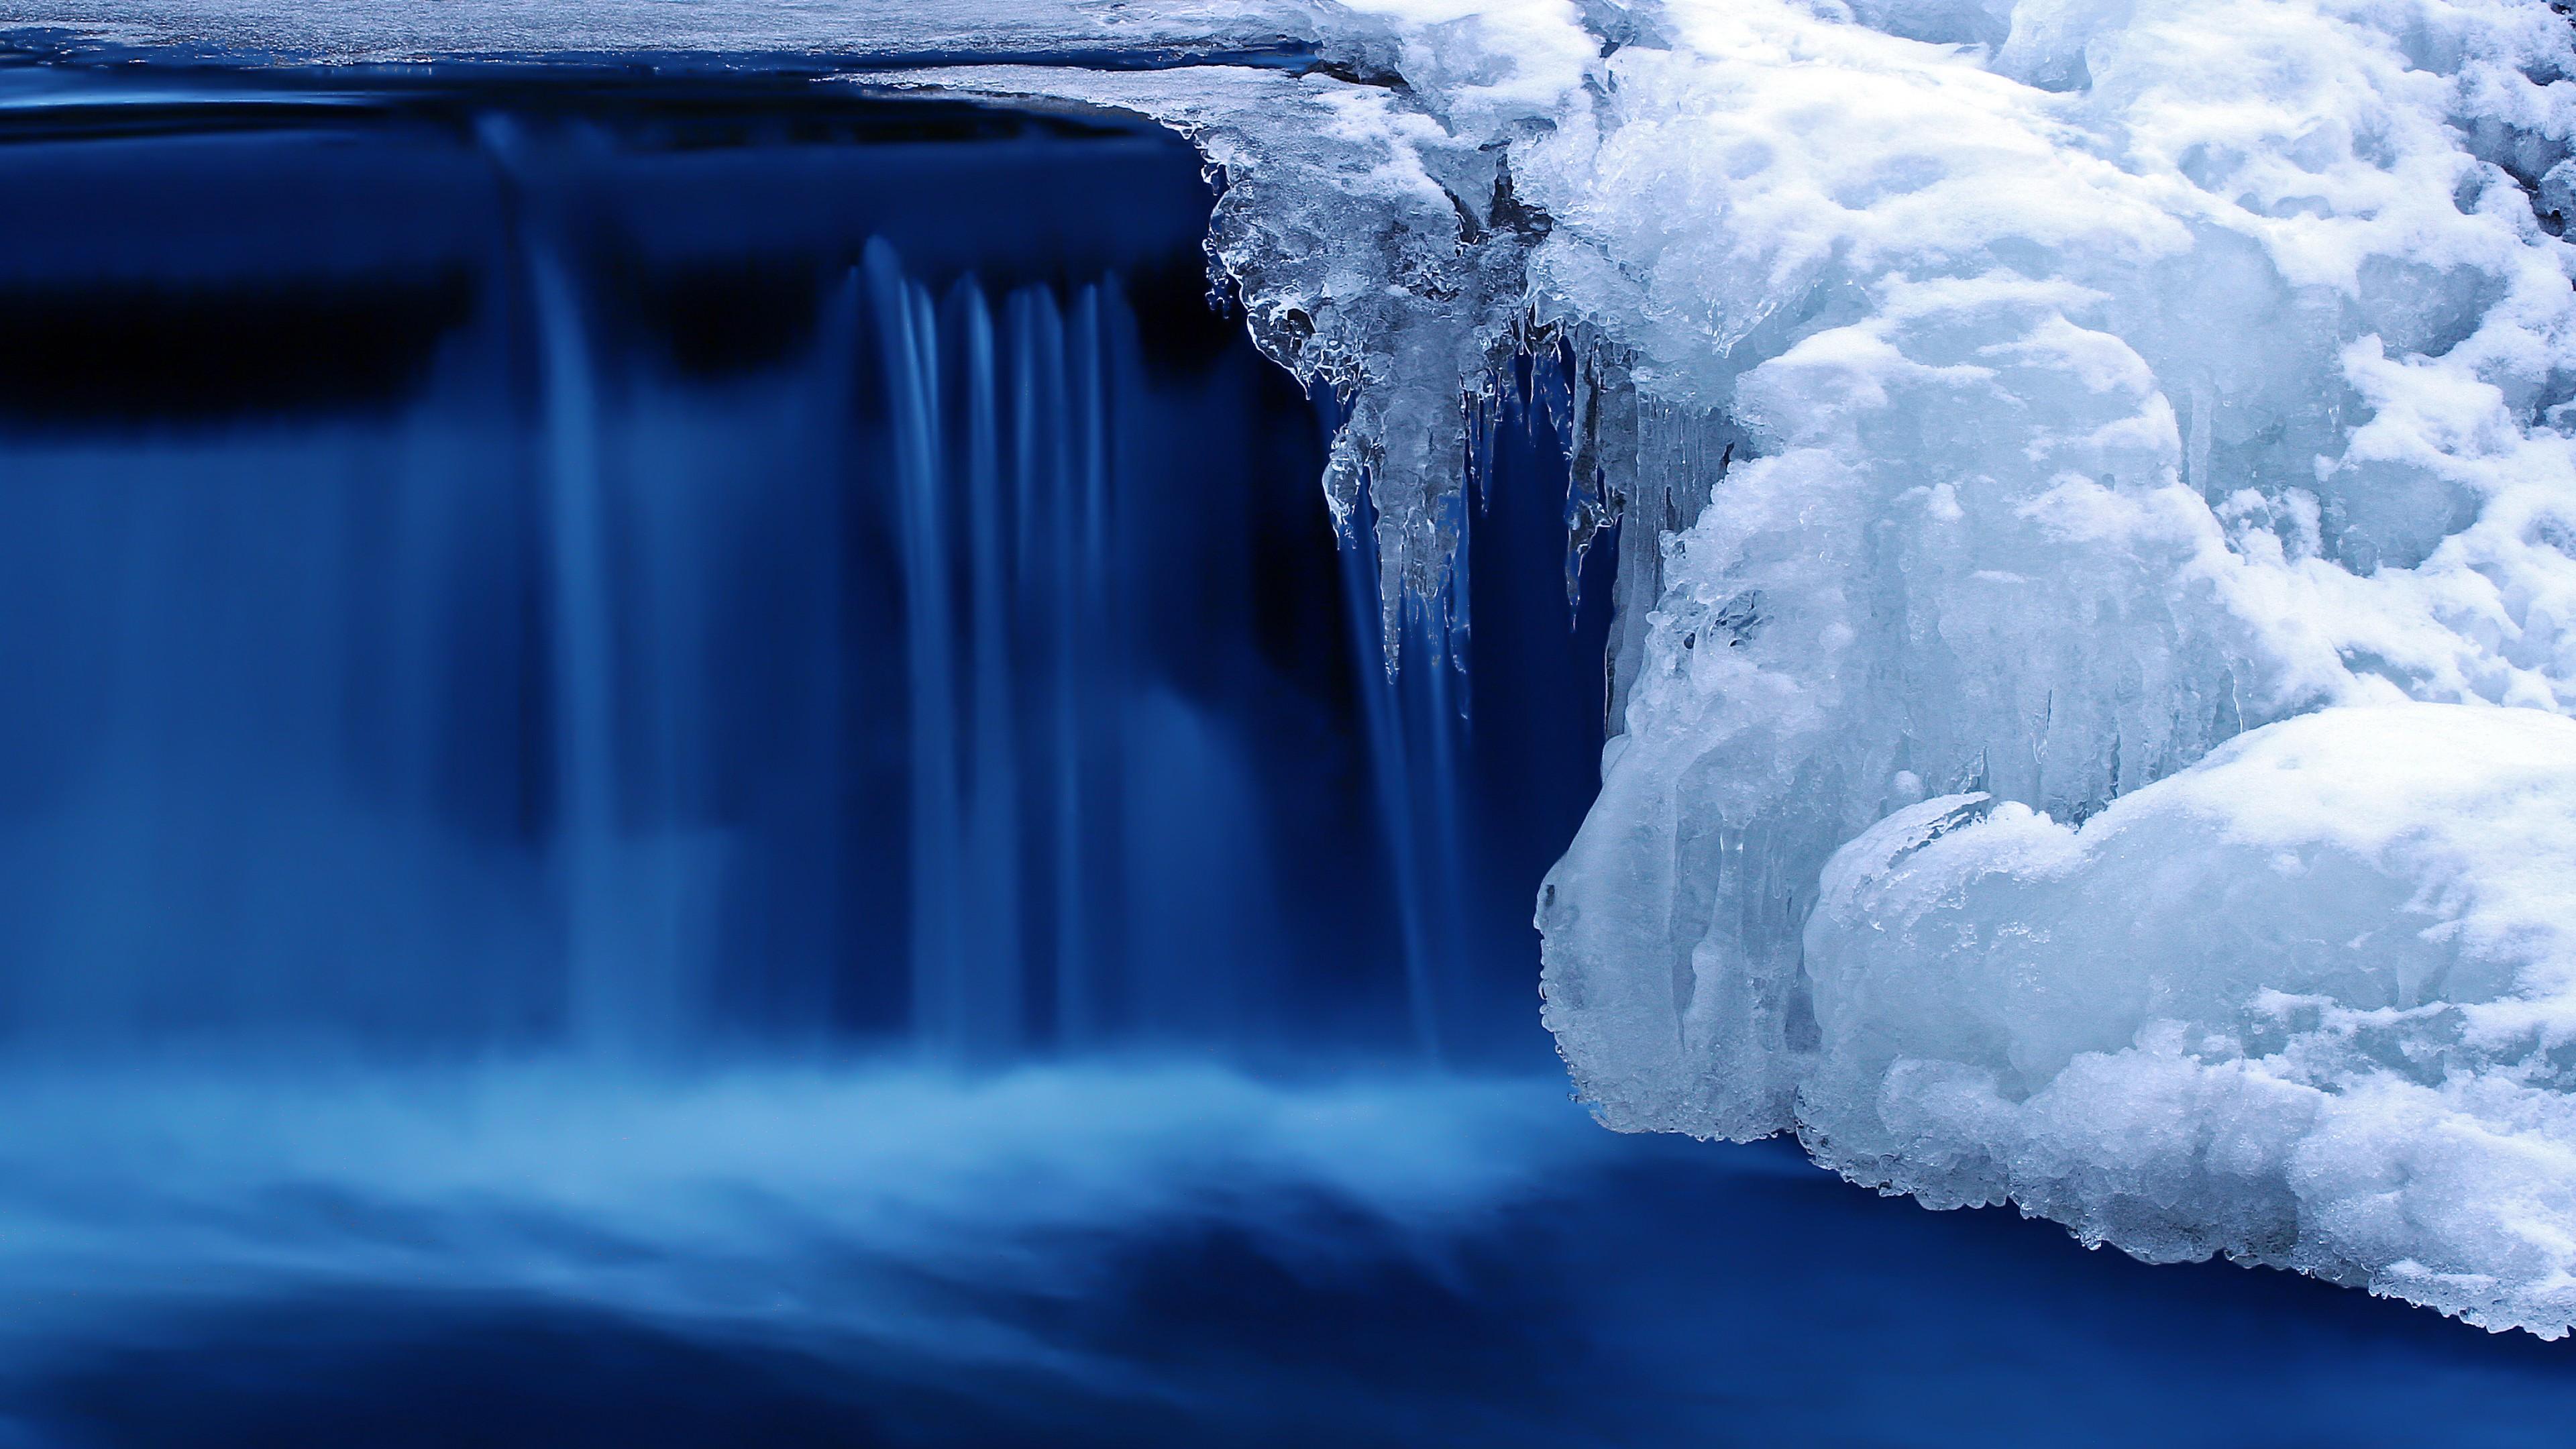 Pinterest Wallpaper Quotes Wallpaper Lake 4k Hd Wallpaper Waterfall Water Snow